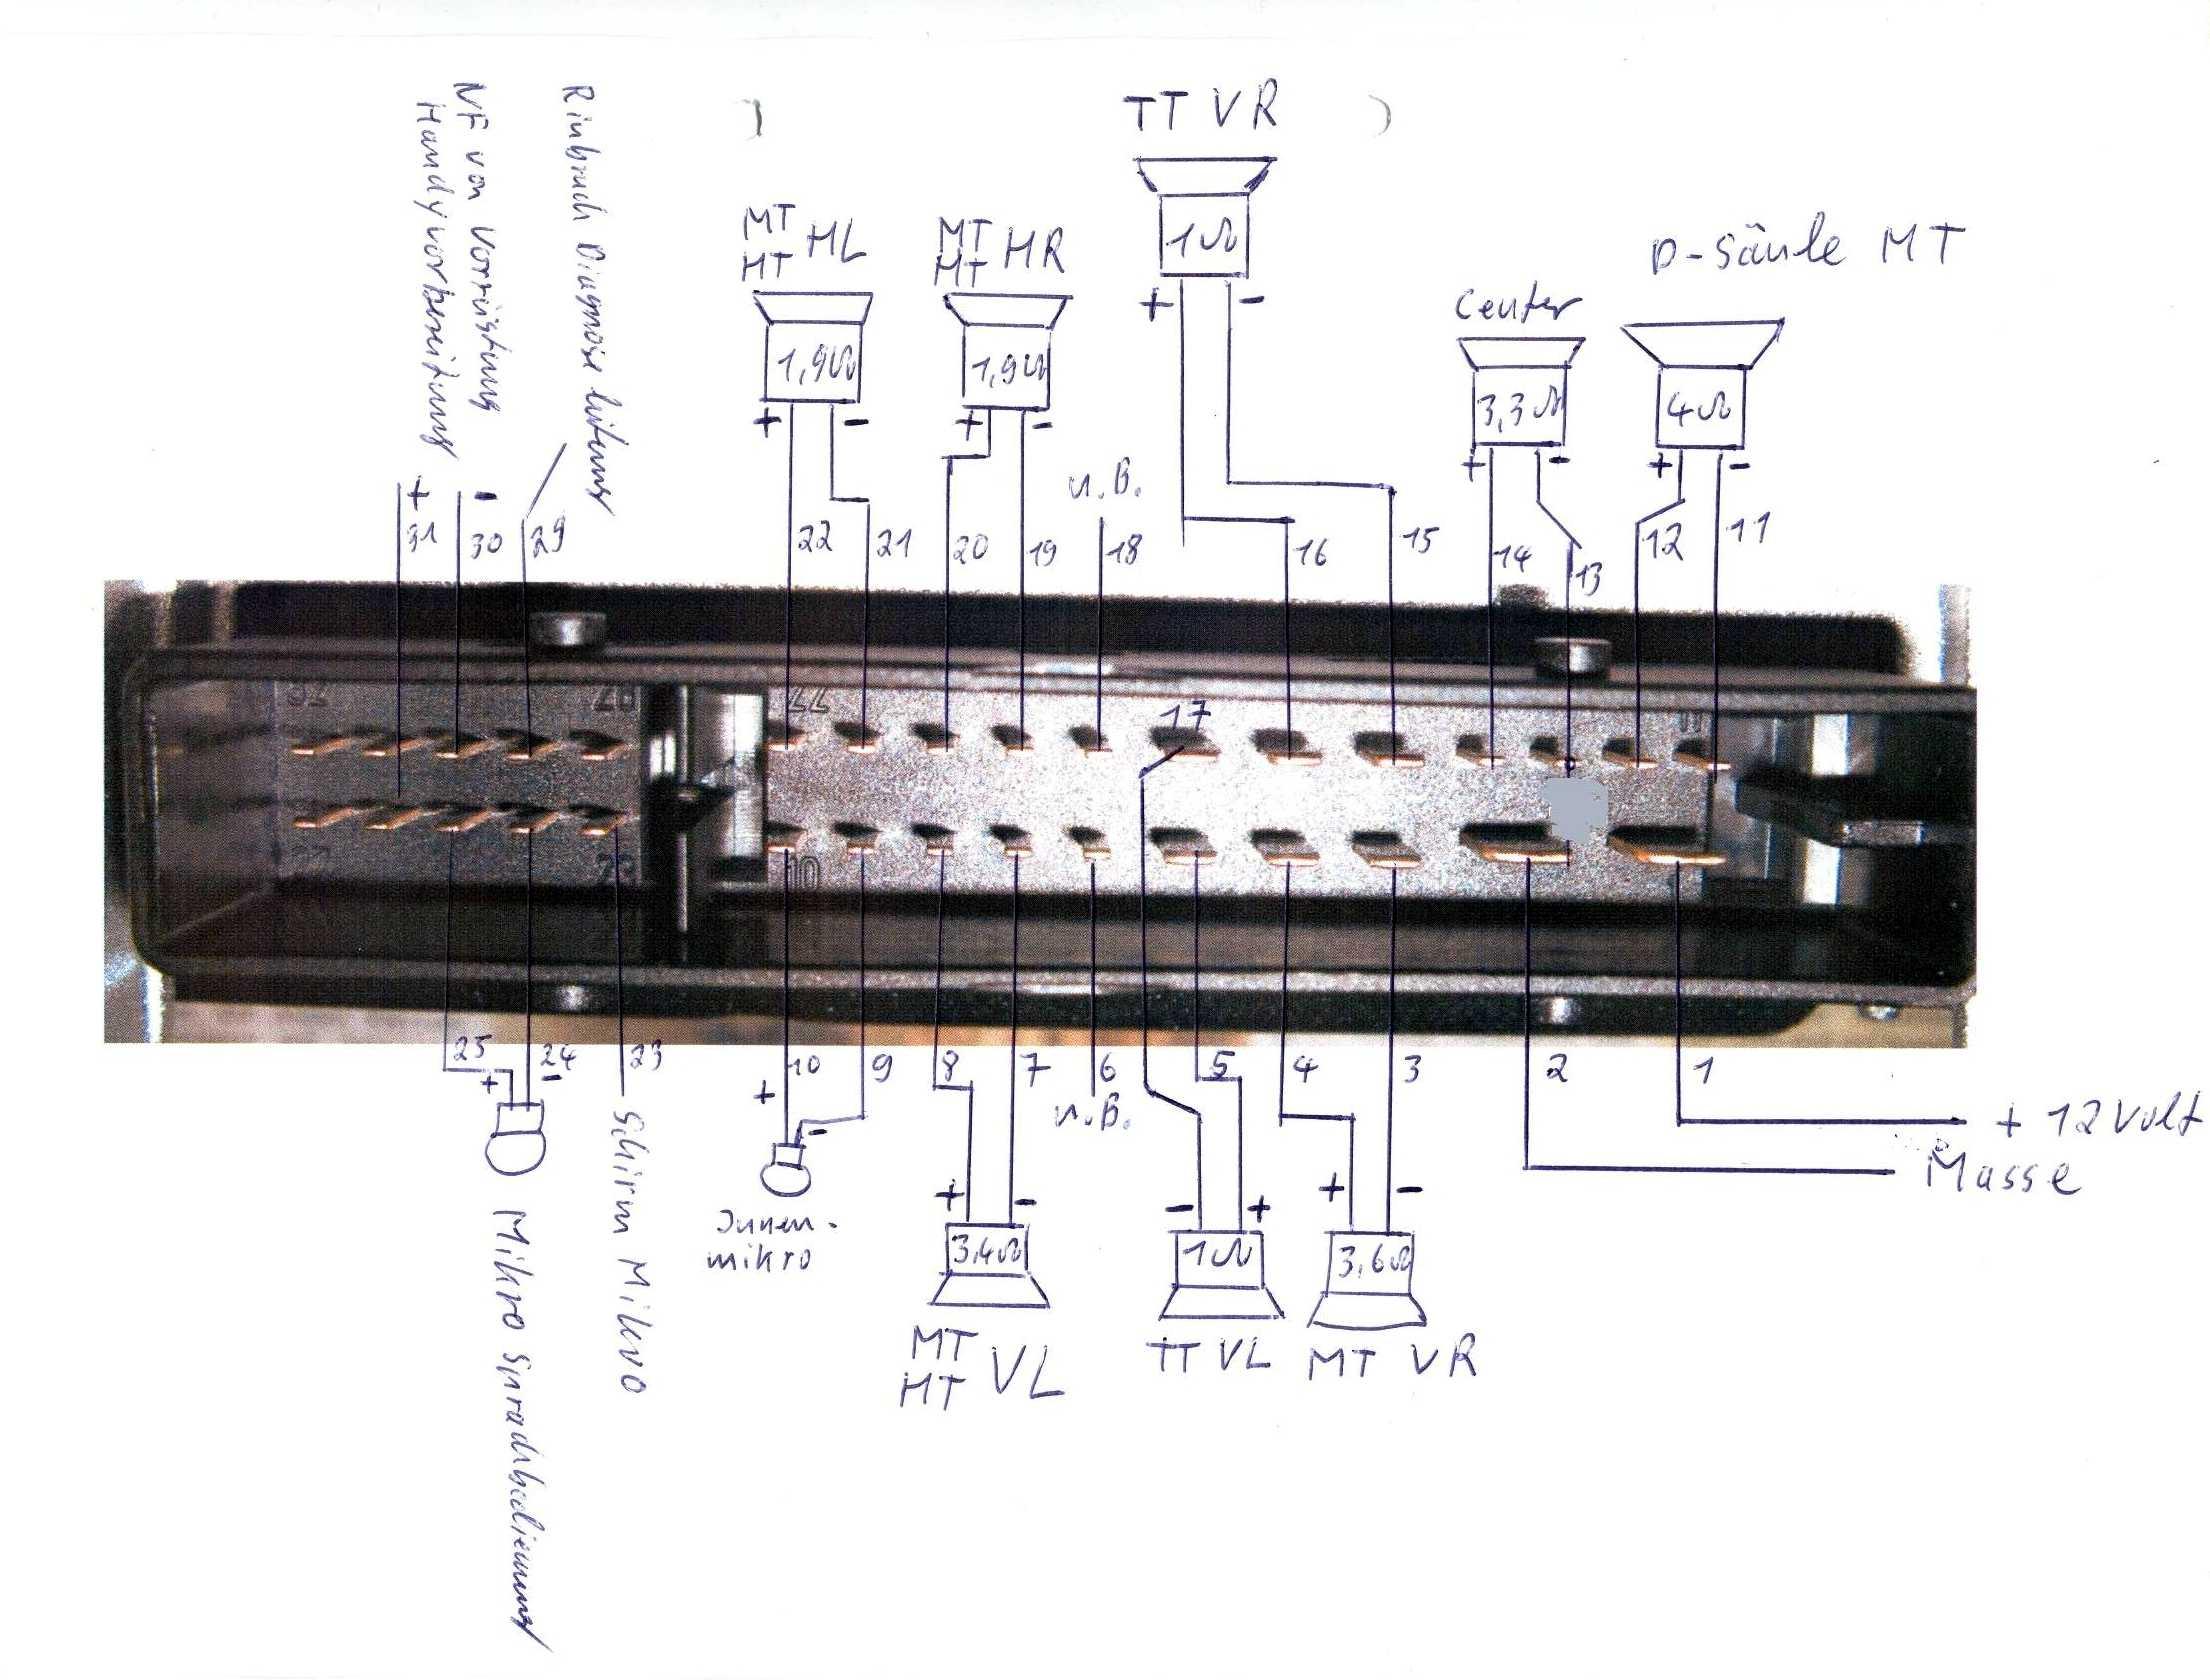 Steckerbelegung Am Bose Amp1 Subwoofer Einbau Bose